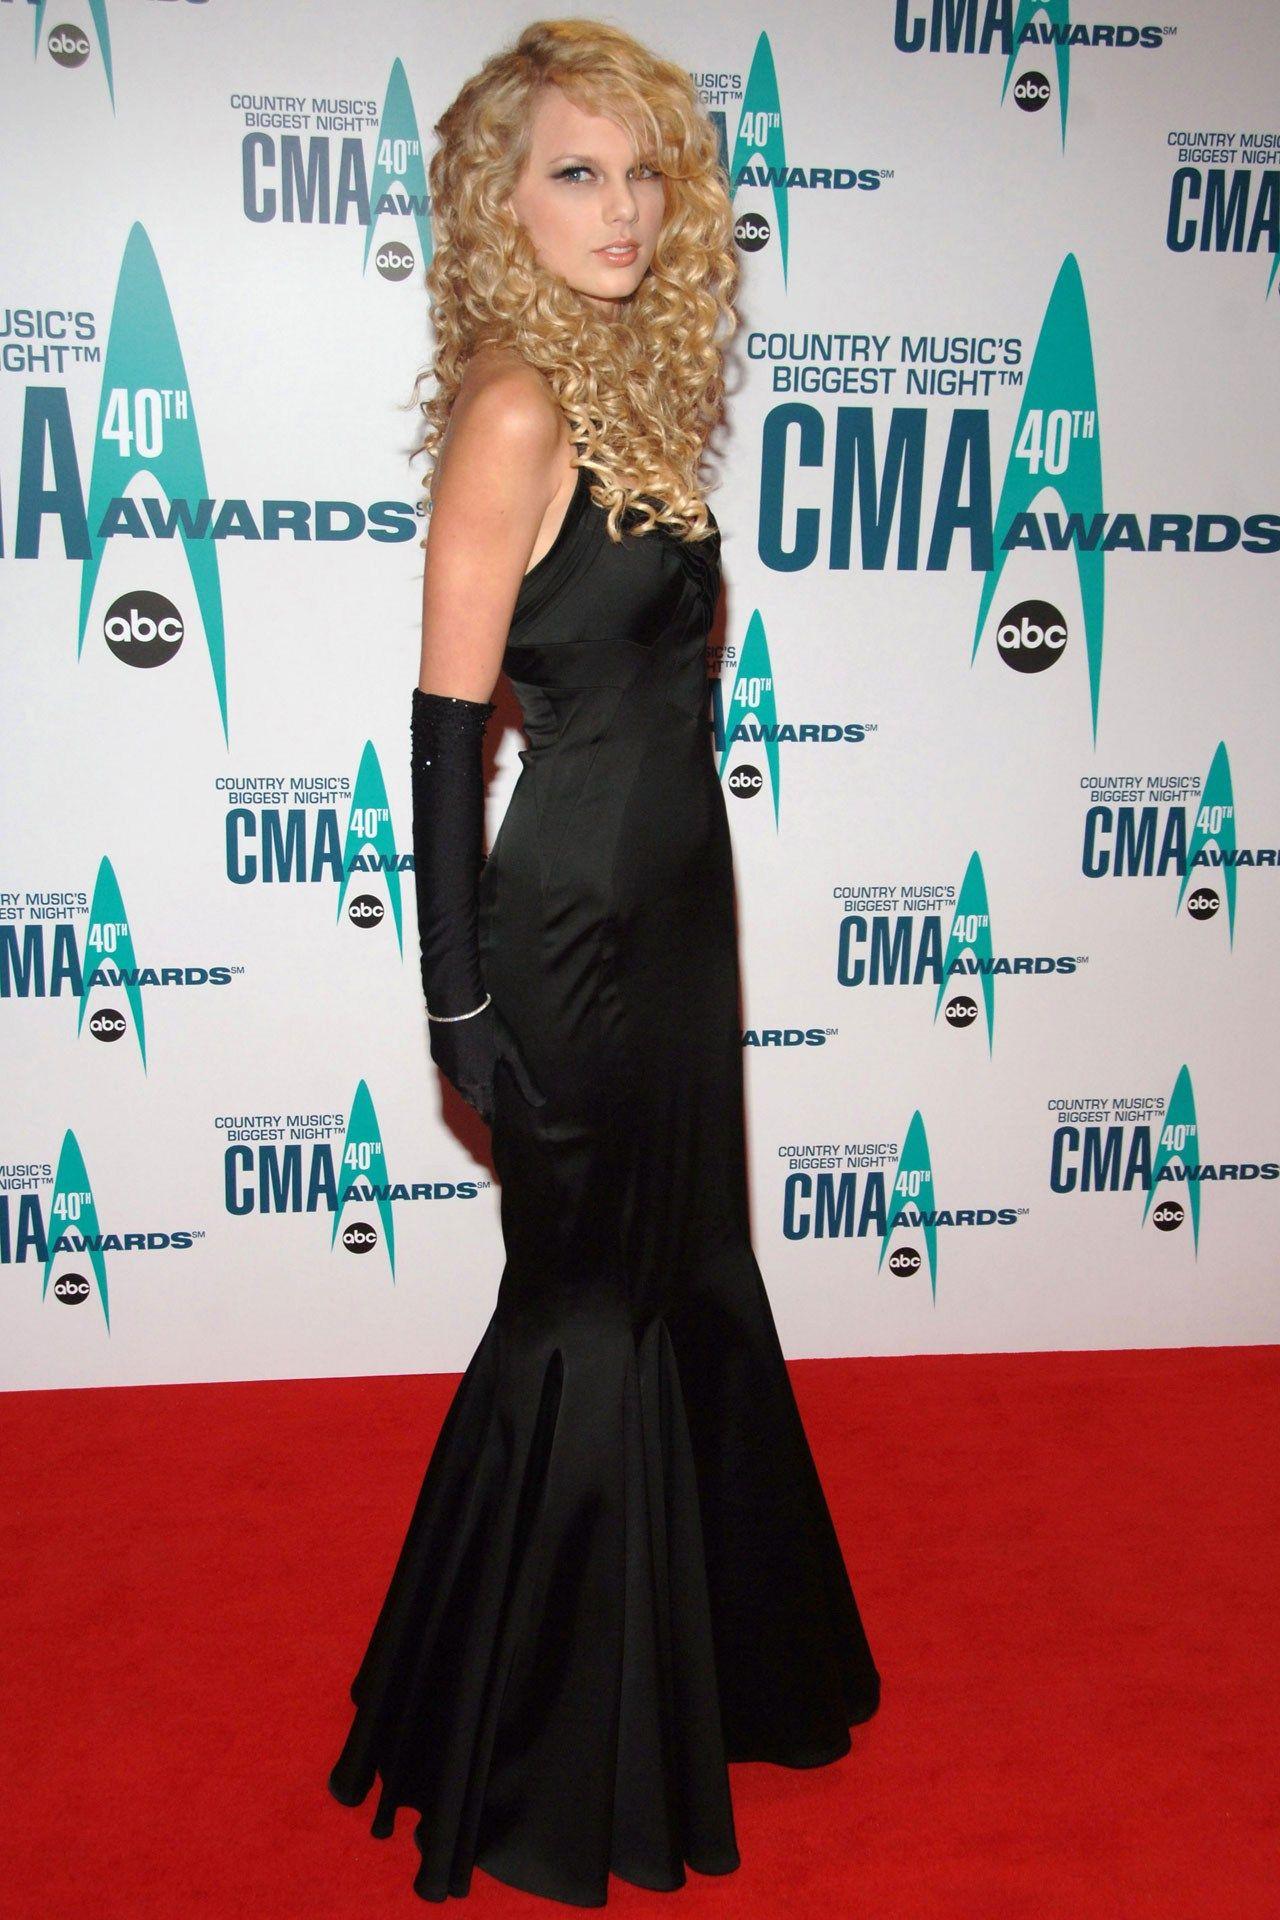 Top CMA Awards Fashion Through The Years   The Nashville Edit